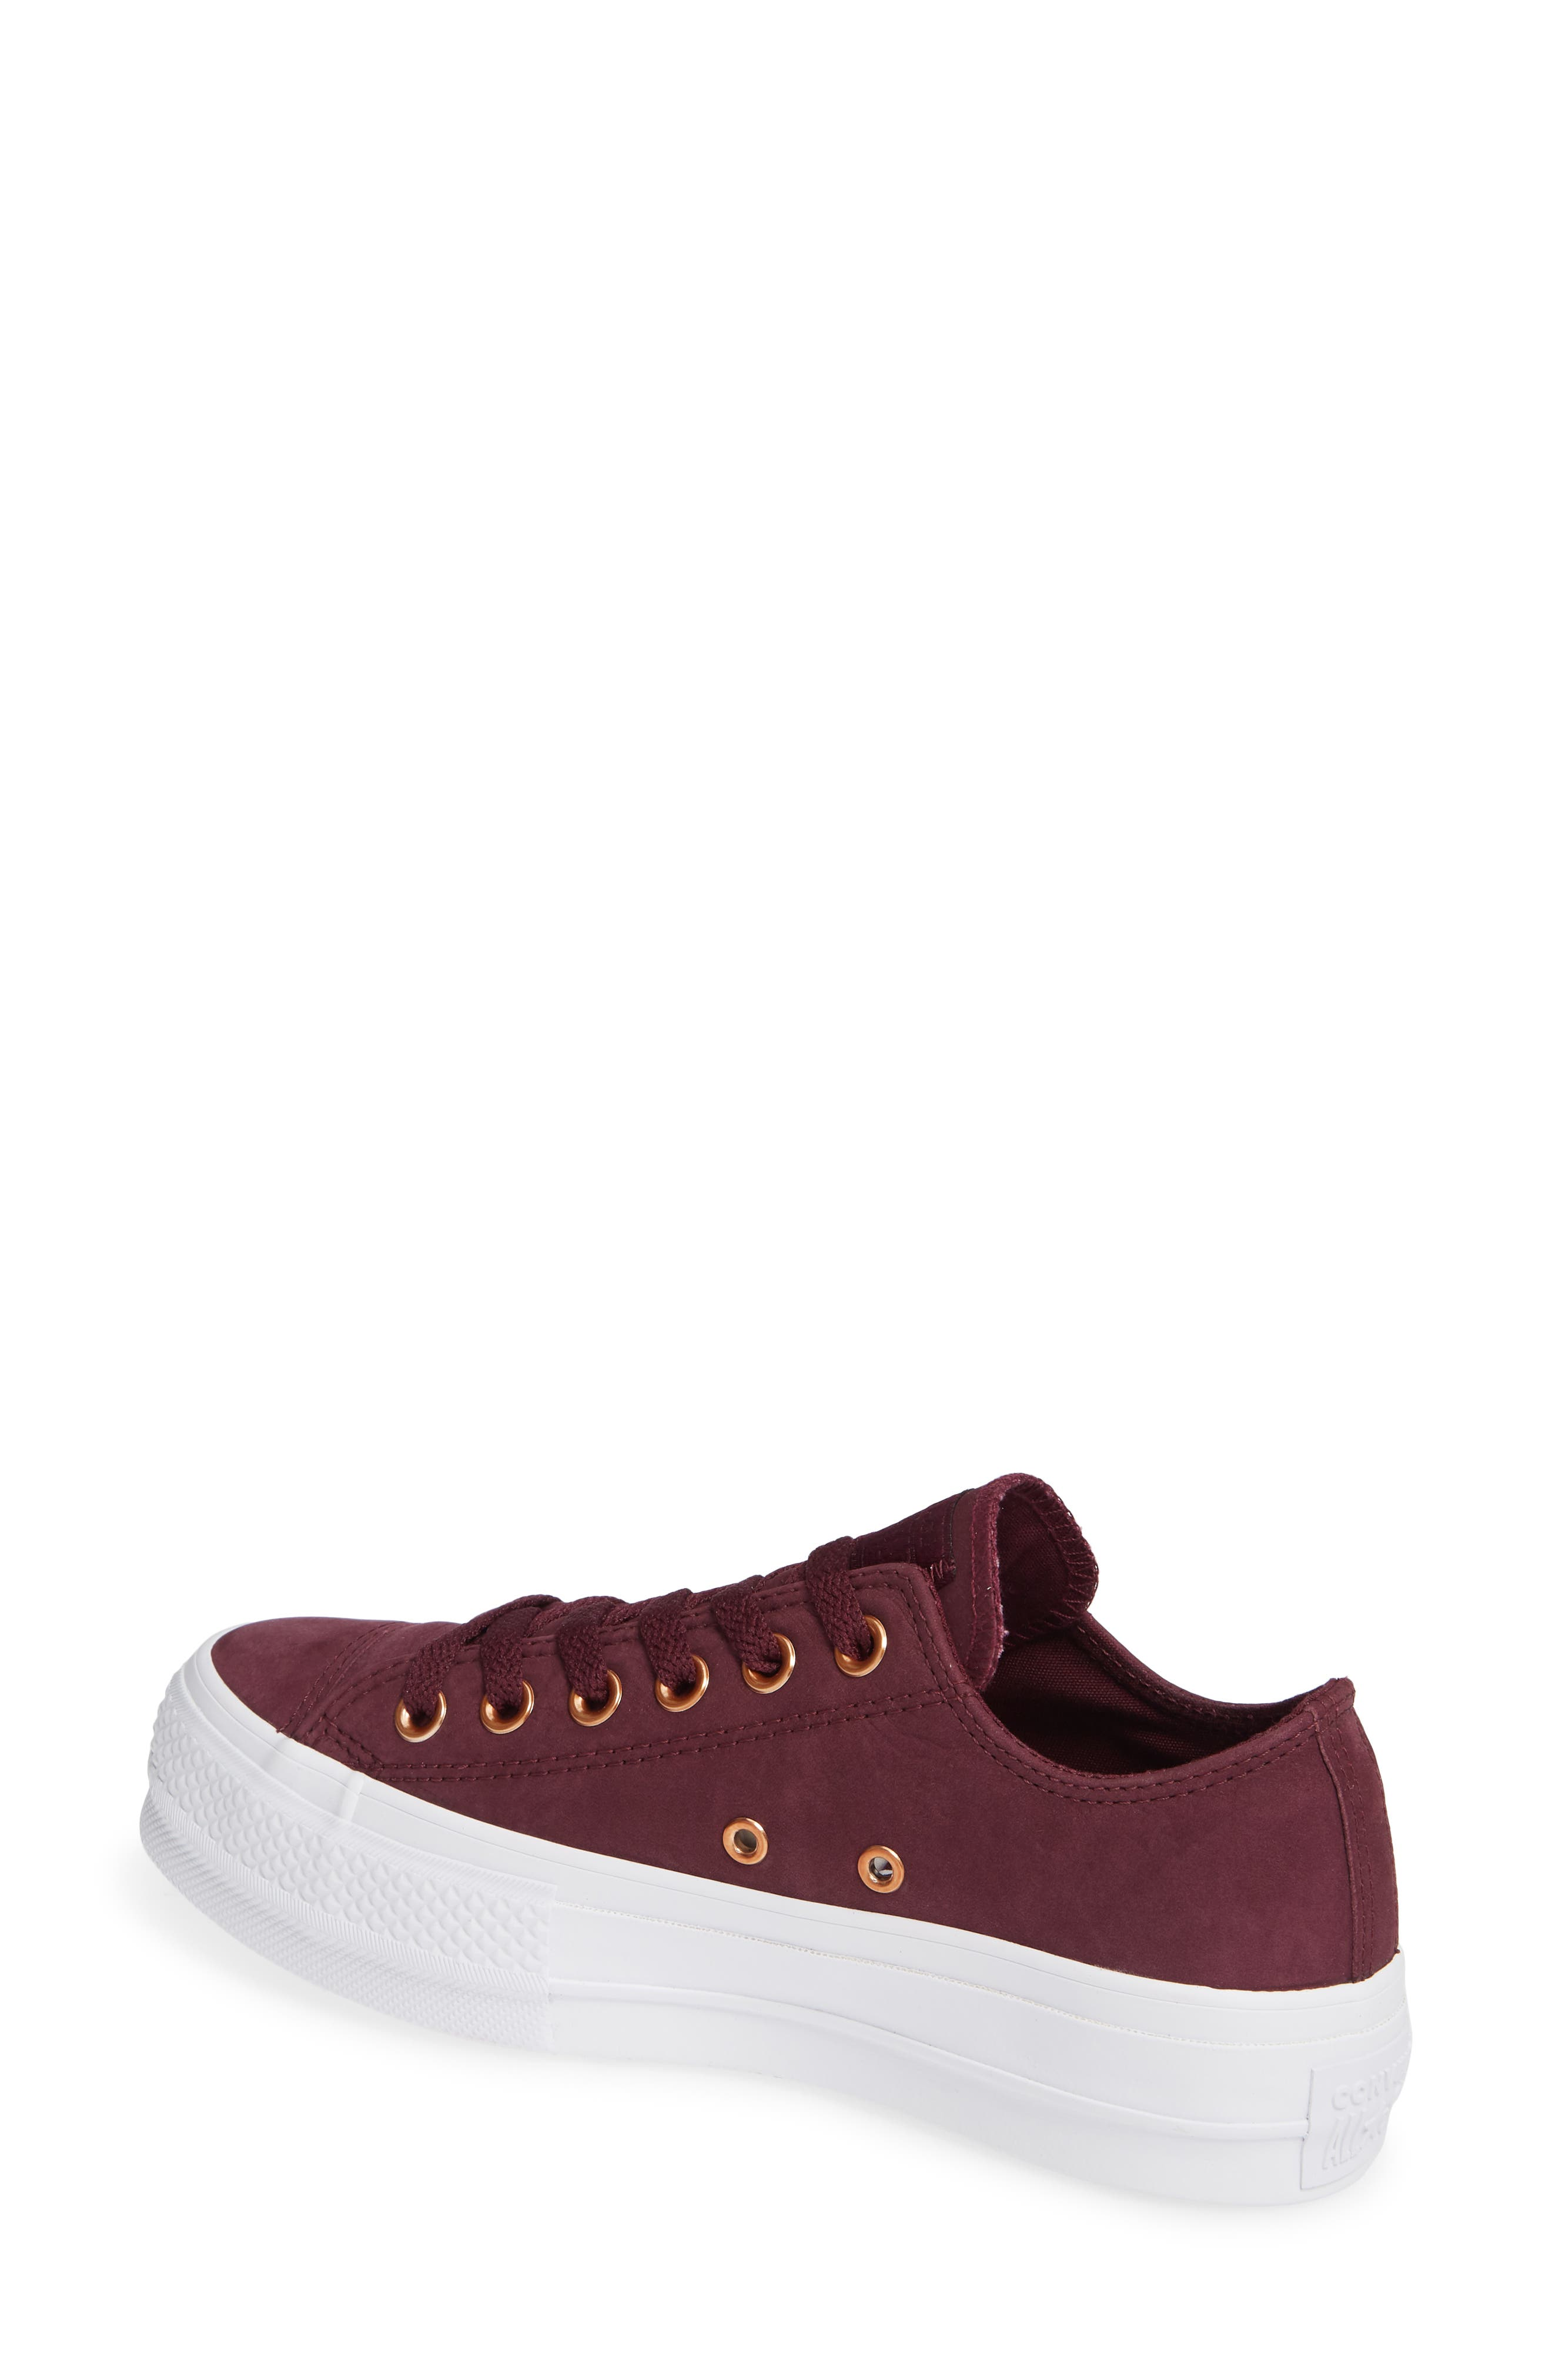 Chuck Taylor<sup>®</sup> All Star<sup>®</sup> Platform Sneaker,                             Alternate thumbnail 2, color,                             Dark Sangria Nubuck